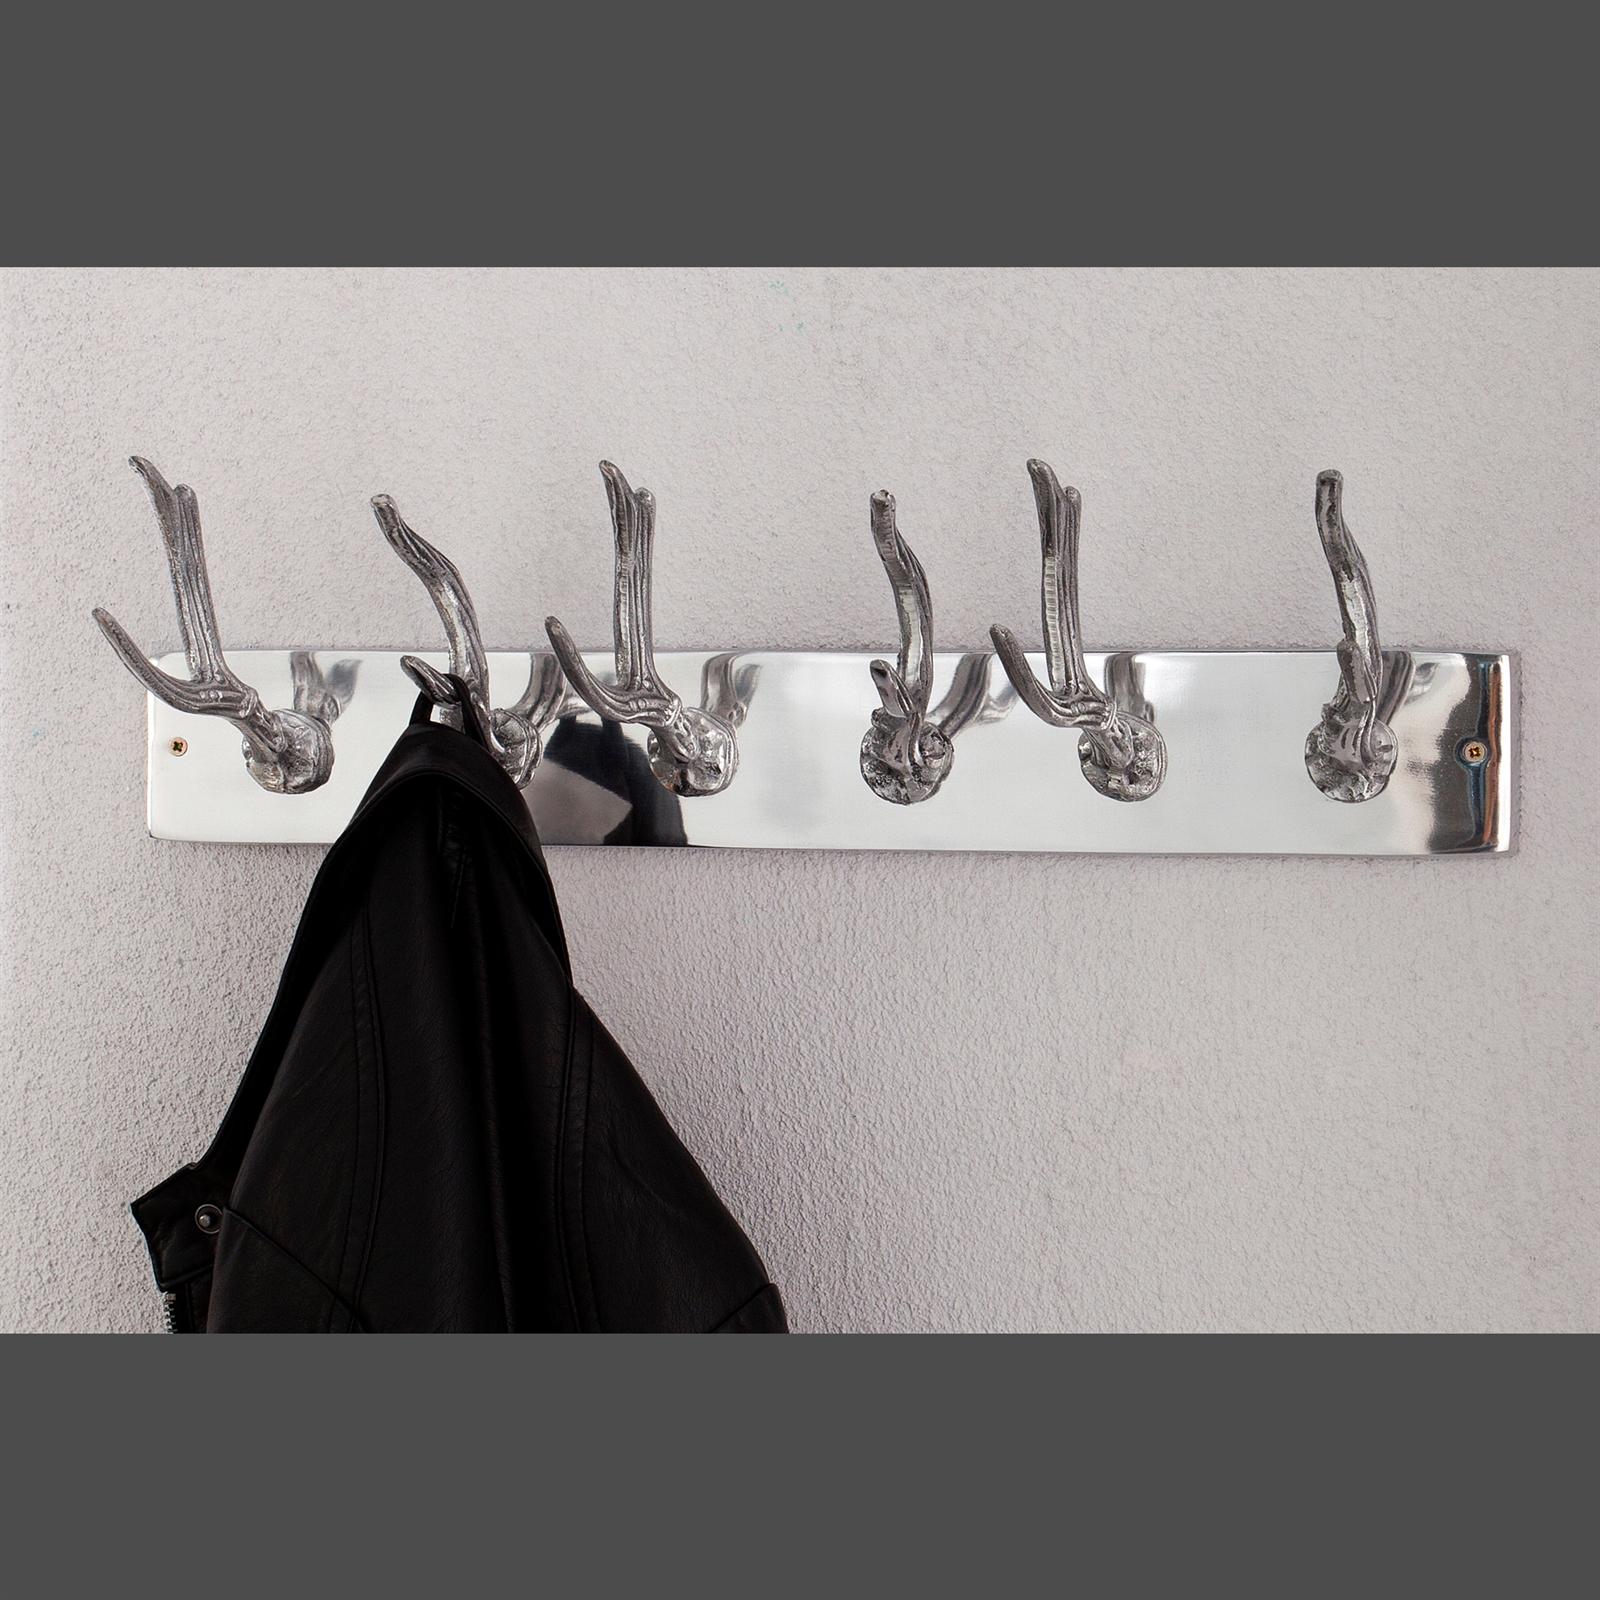 Originelle wandgarderobe antler garderobe mit 6 geweih for Garderobe 6 haken